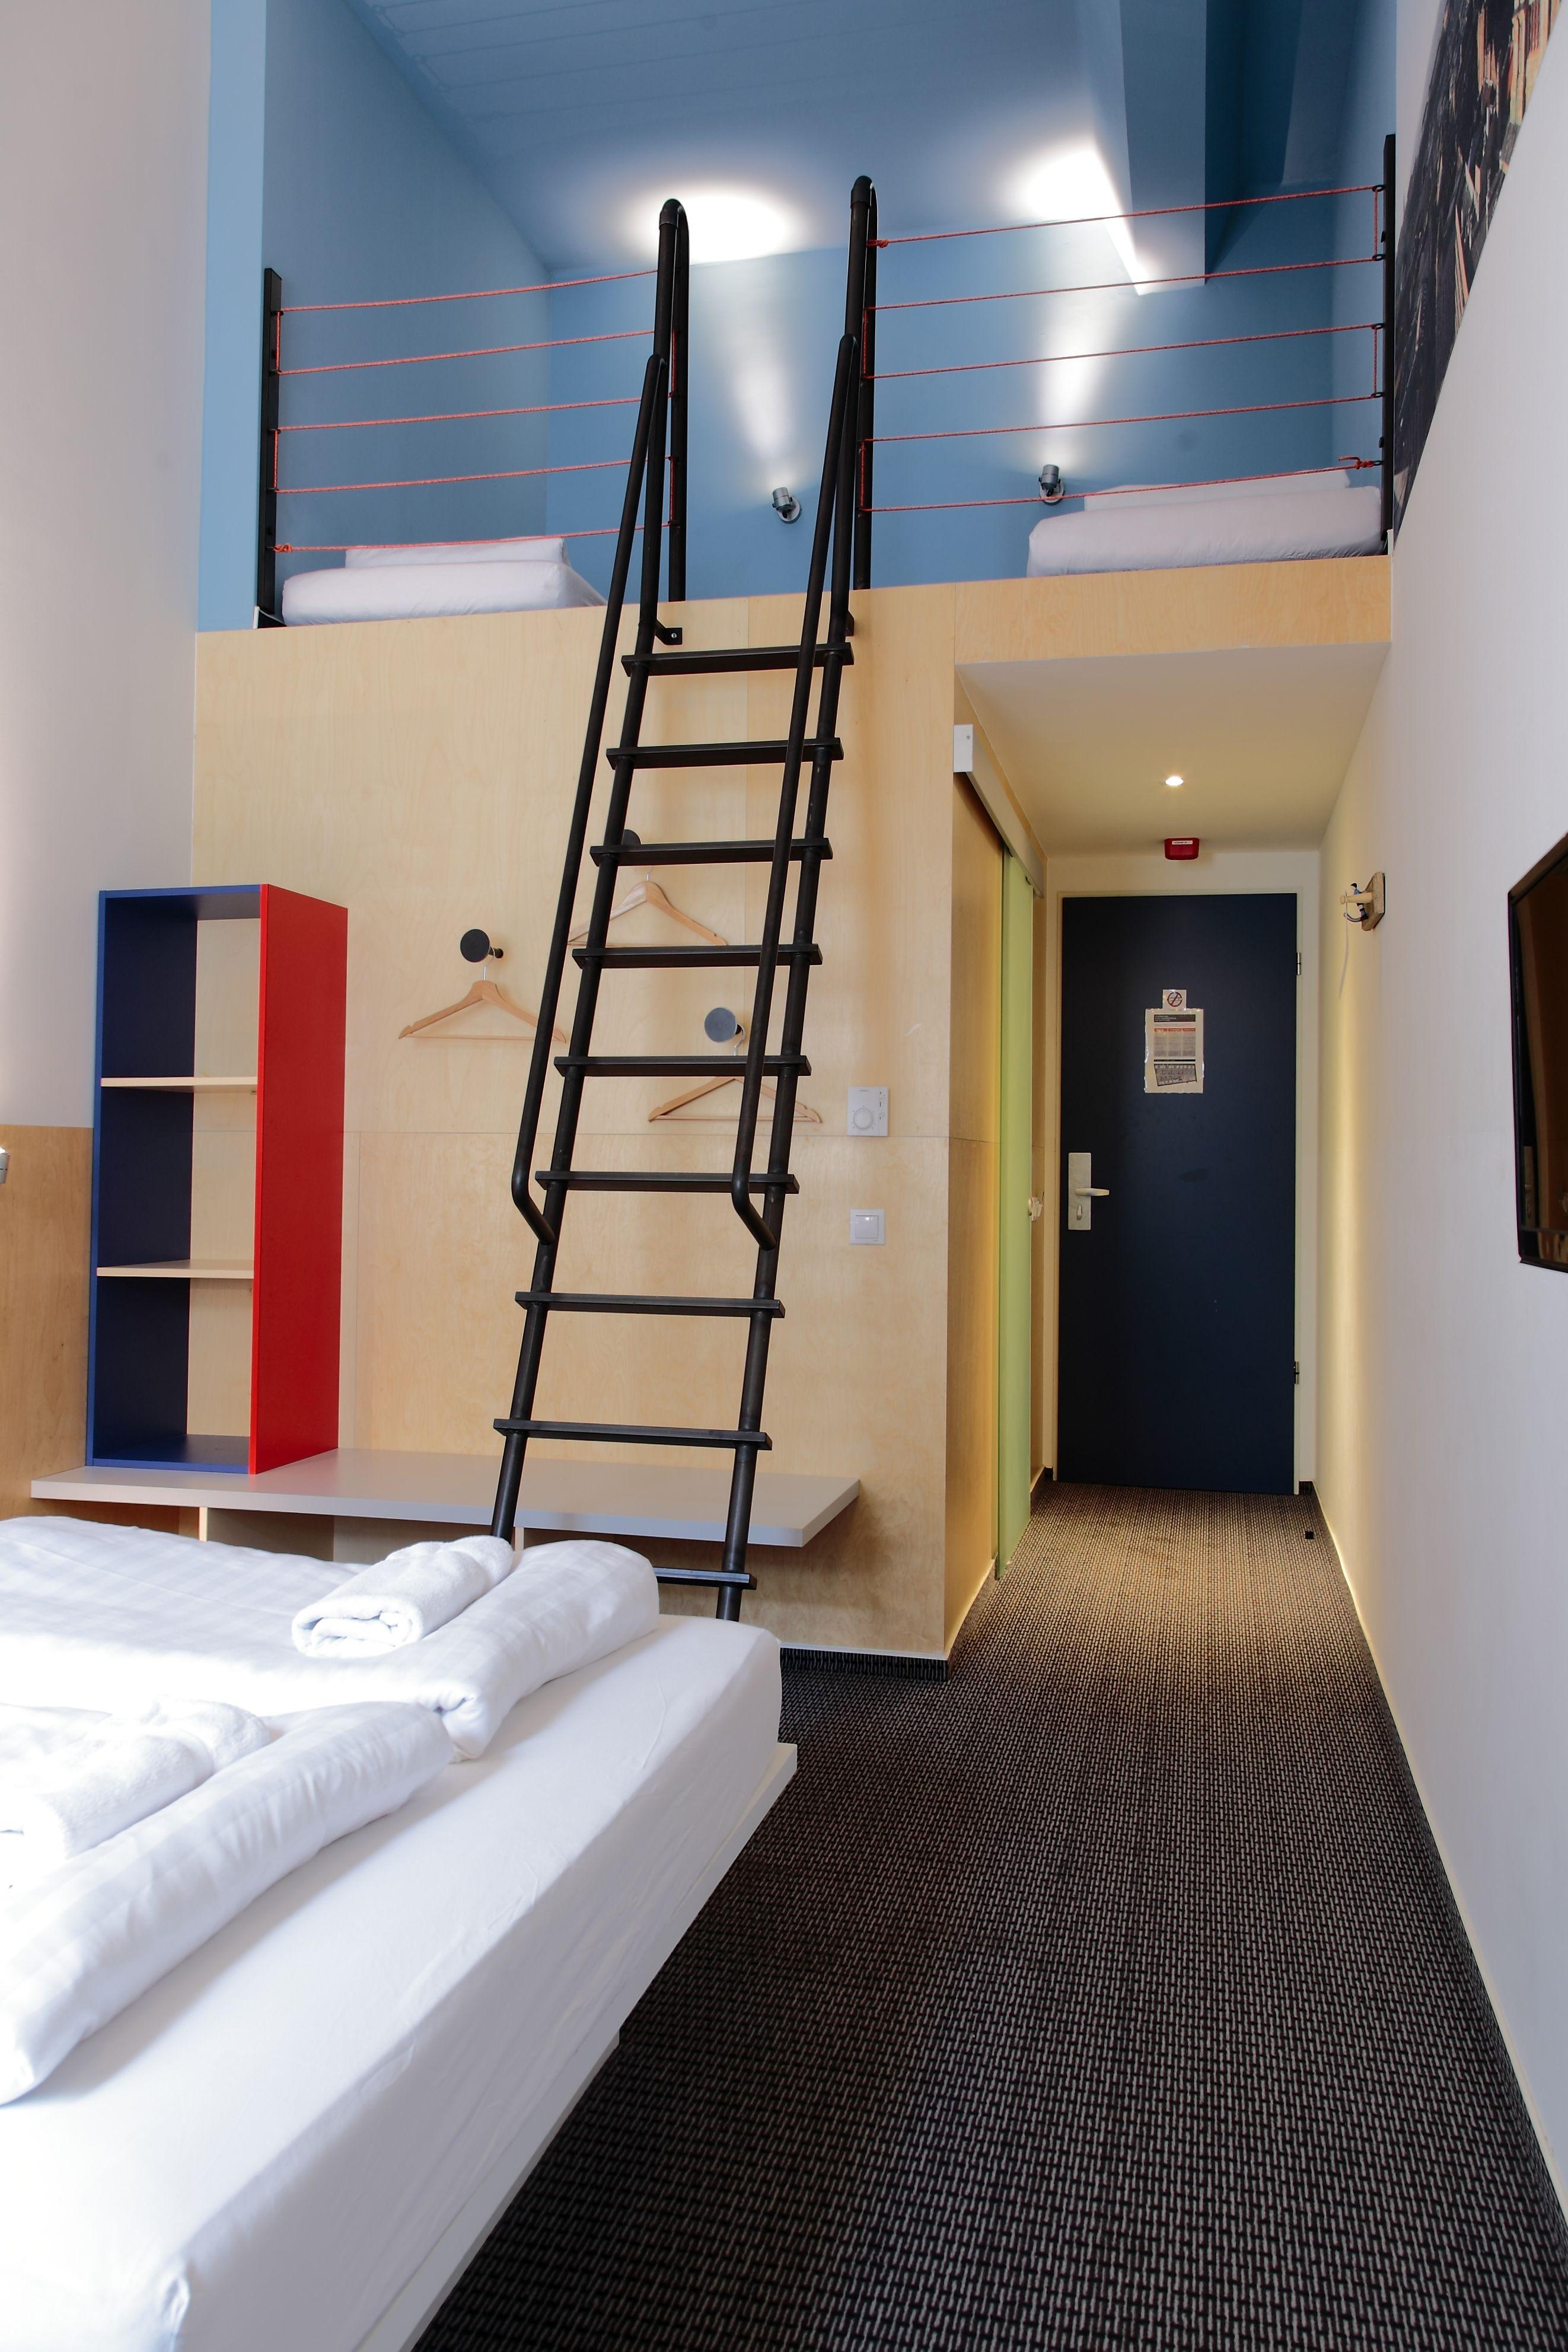 8 bed dormitory maverick maverickcitylodge budapest hungary